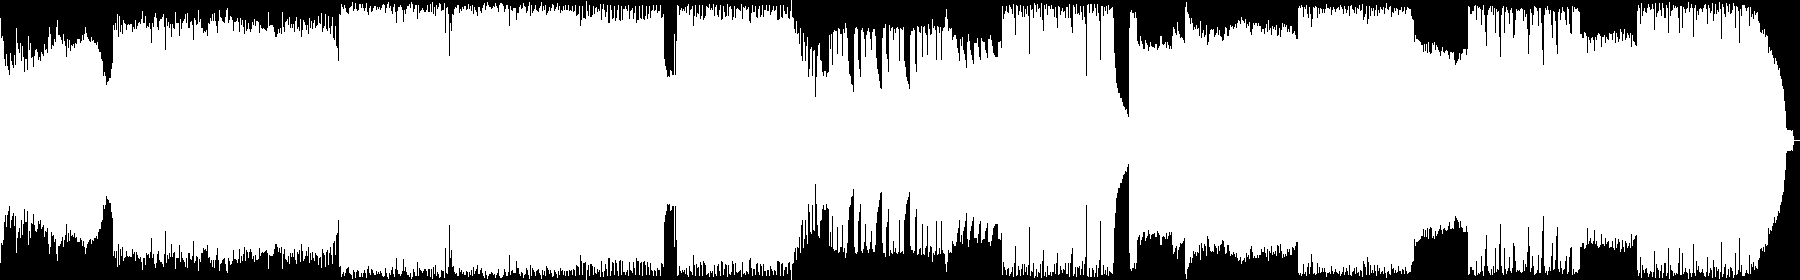 Andromeda – Progressive Trance audio waveform